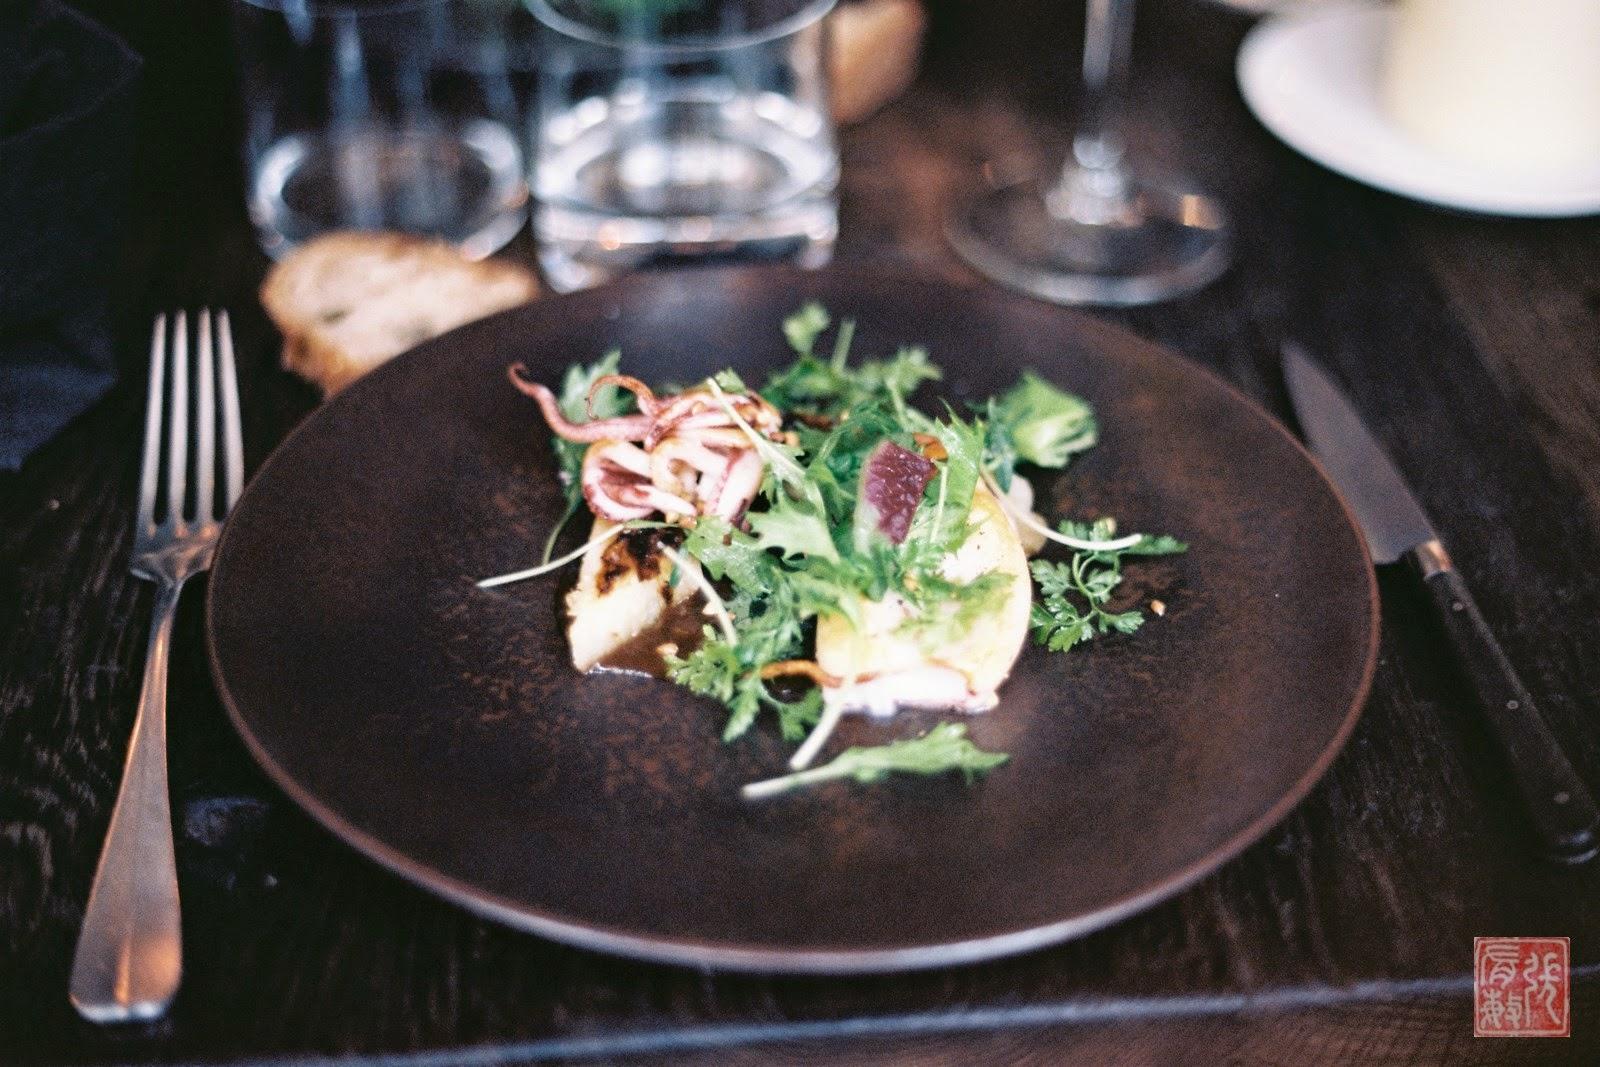 http://lefooding.com/fr/restaurants/restaurant-septime-paris